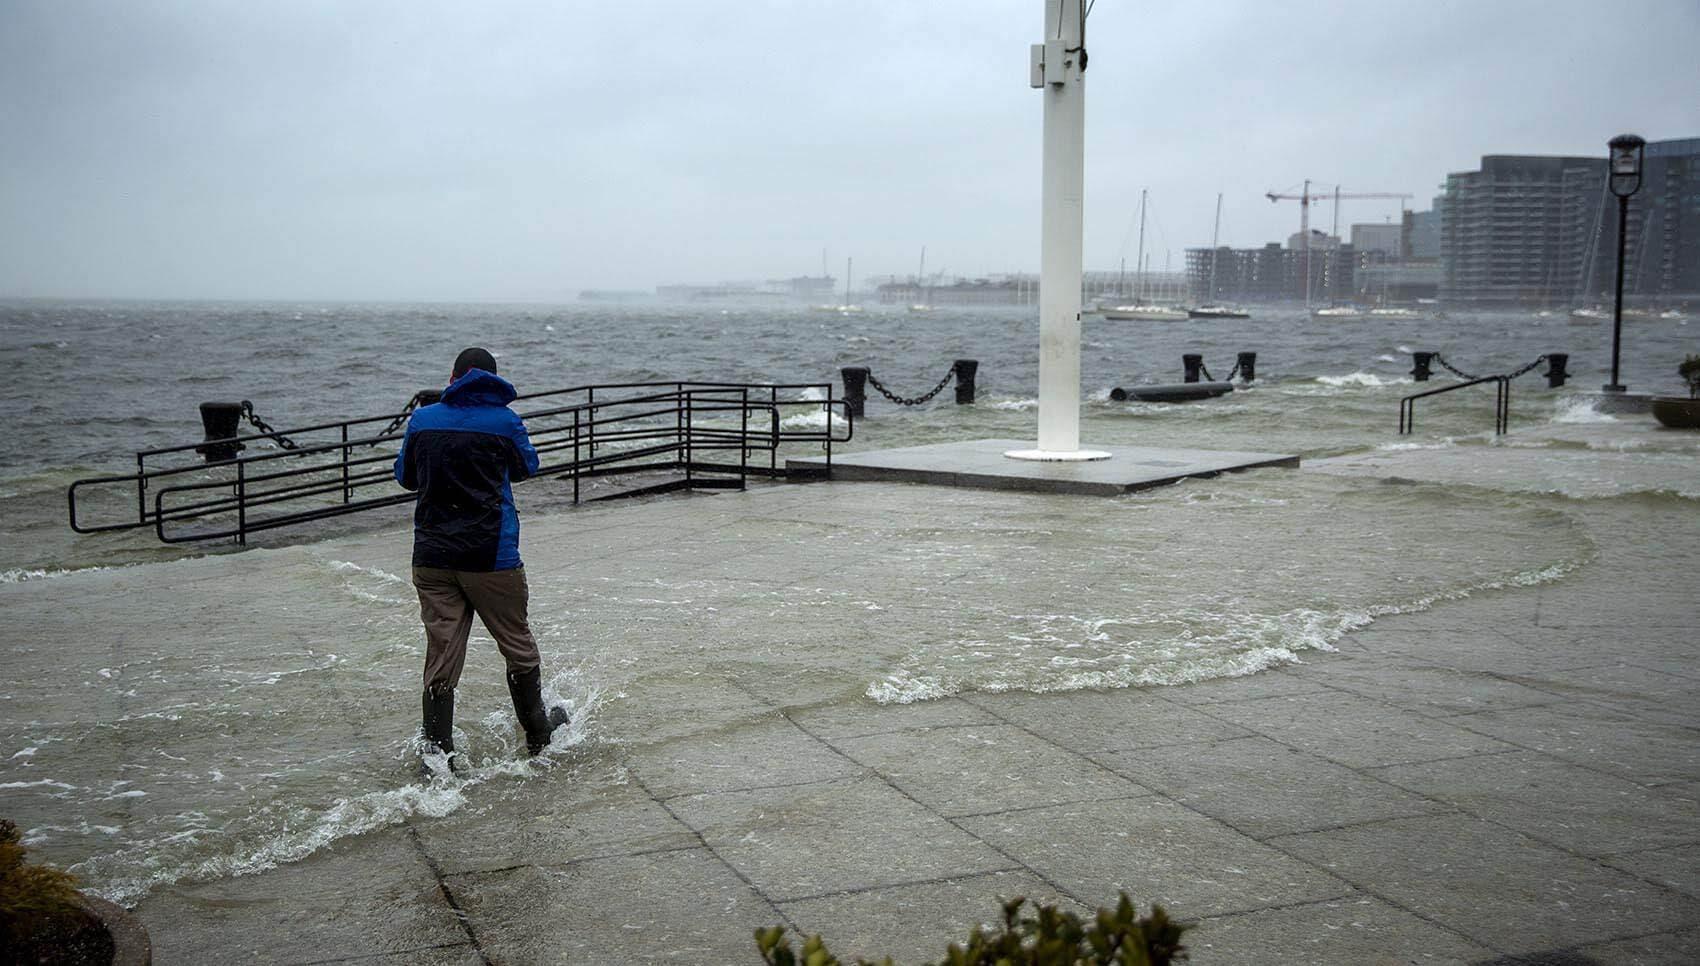 A man walks through water flooding over Long Wharf in Boston. (Robin Lubbock/WBUR)